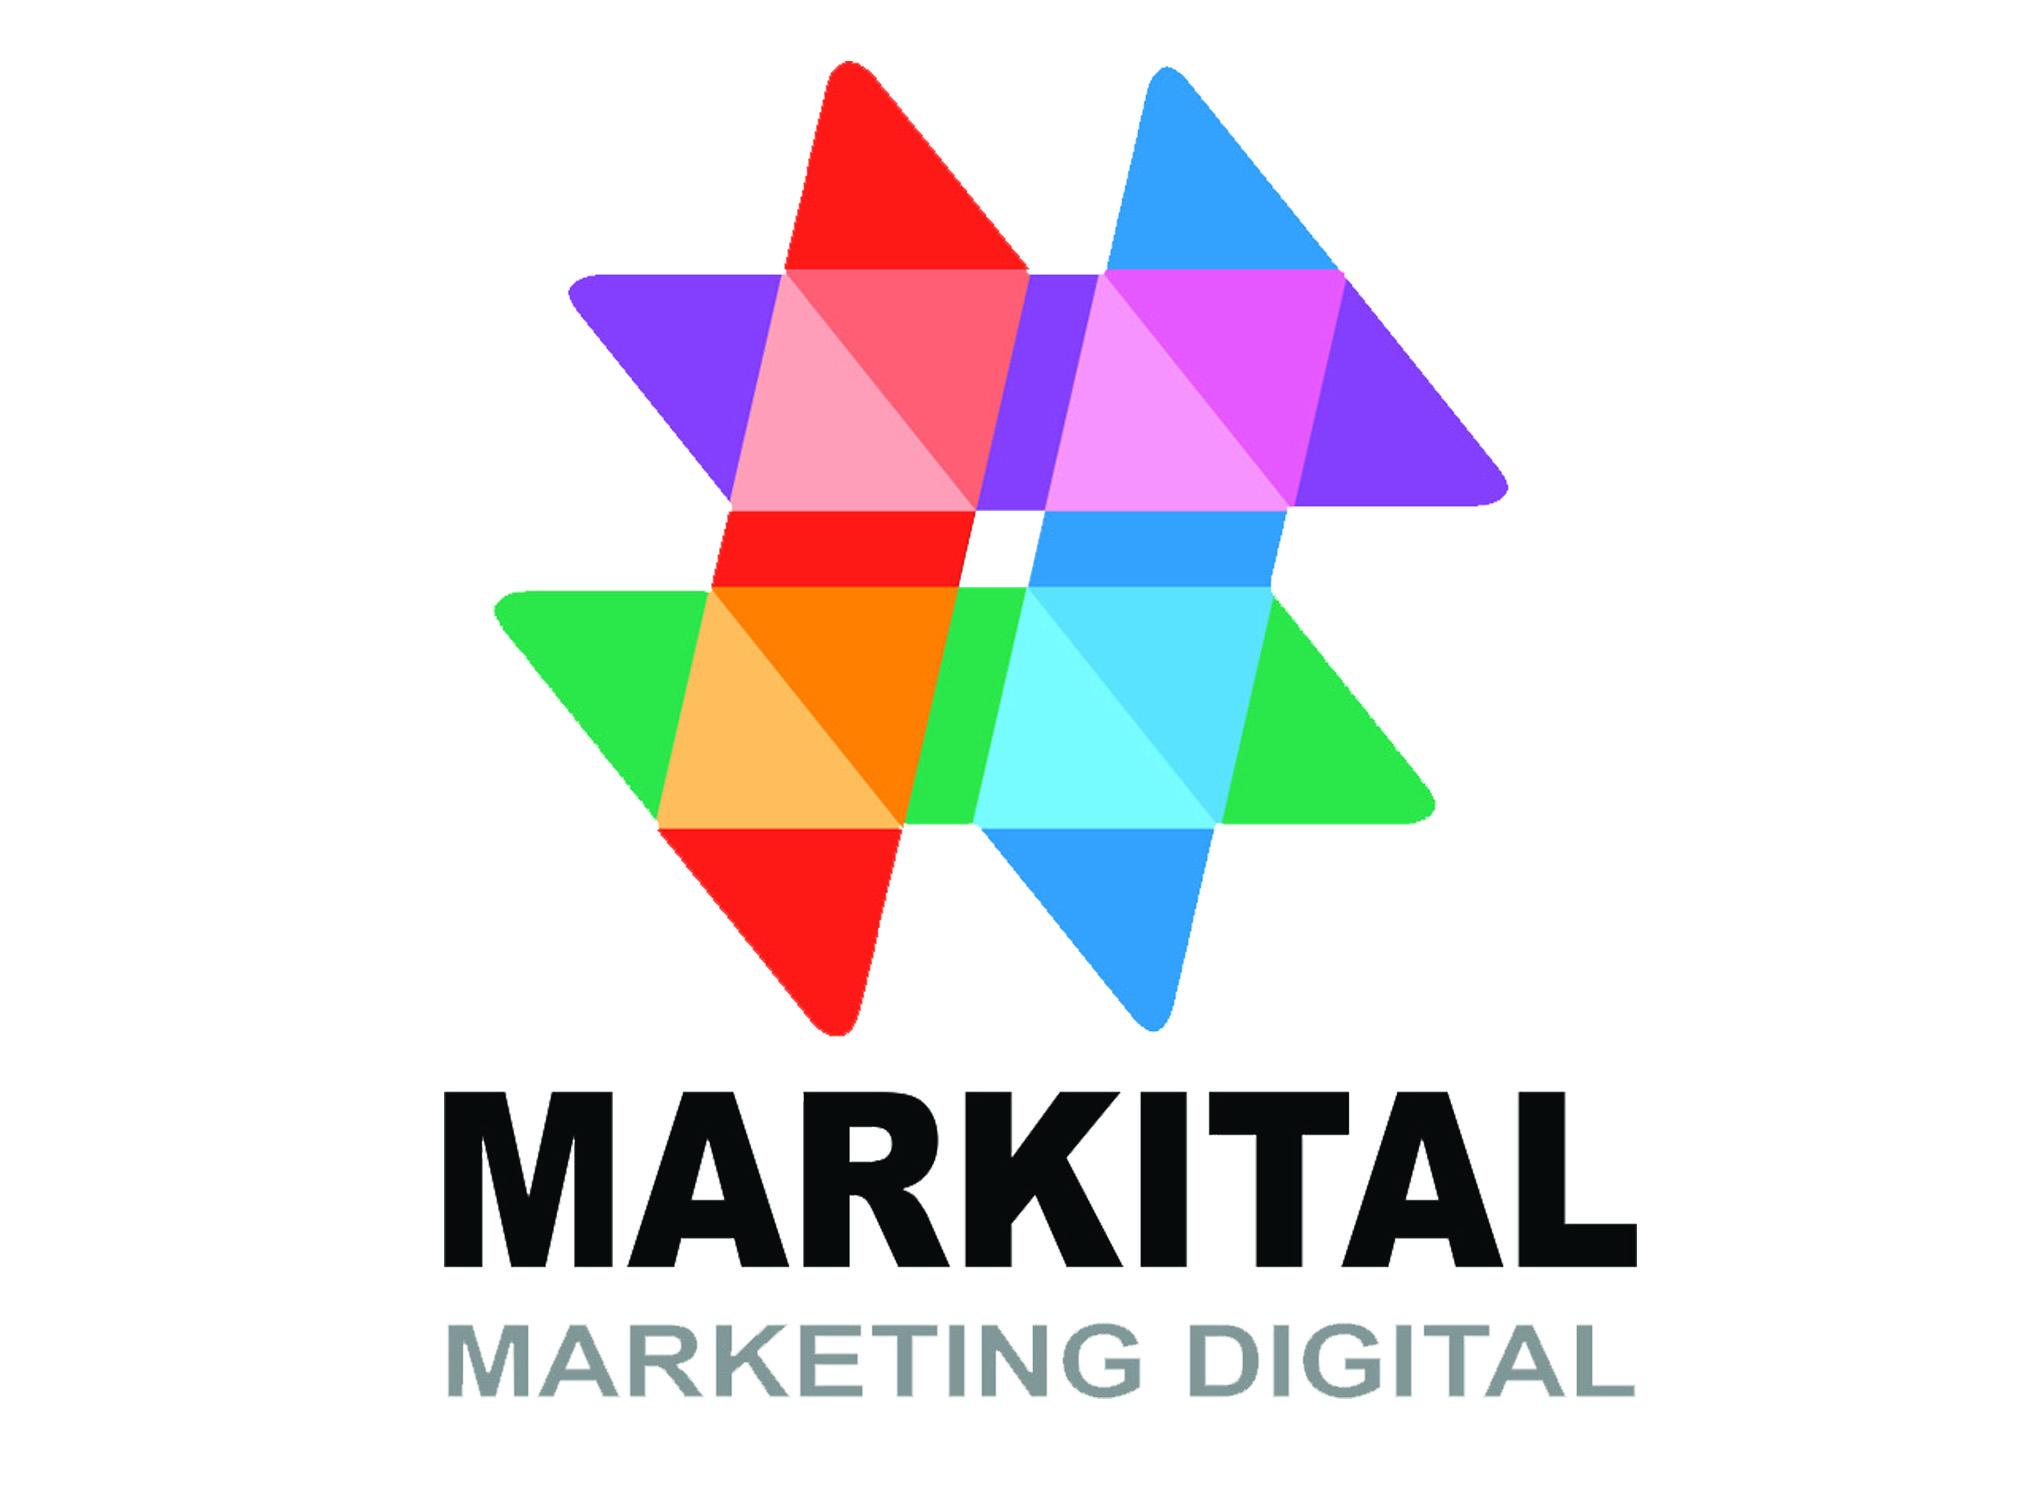 Markital - Marketing Digital